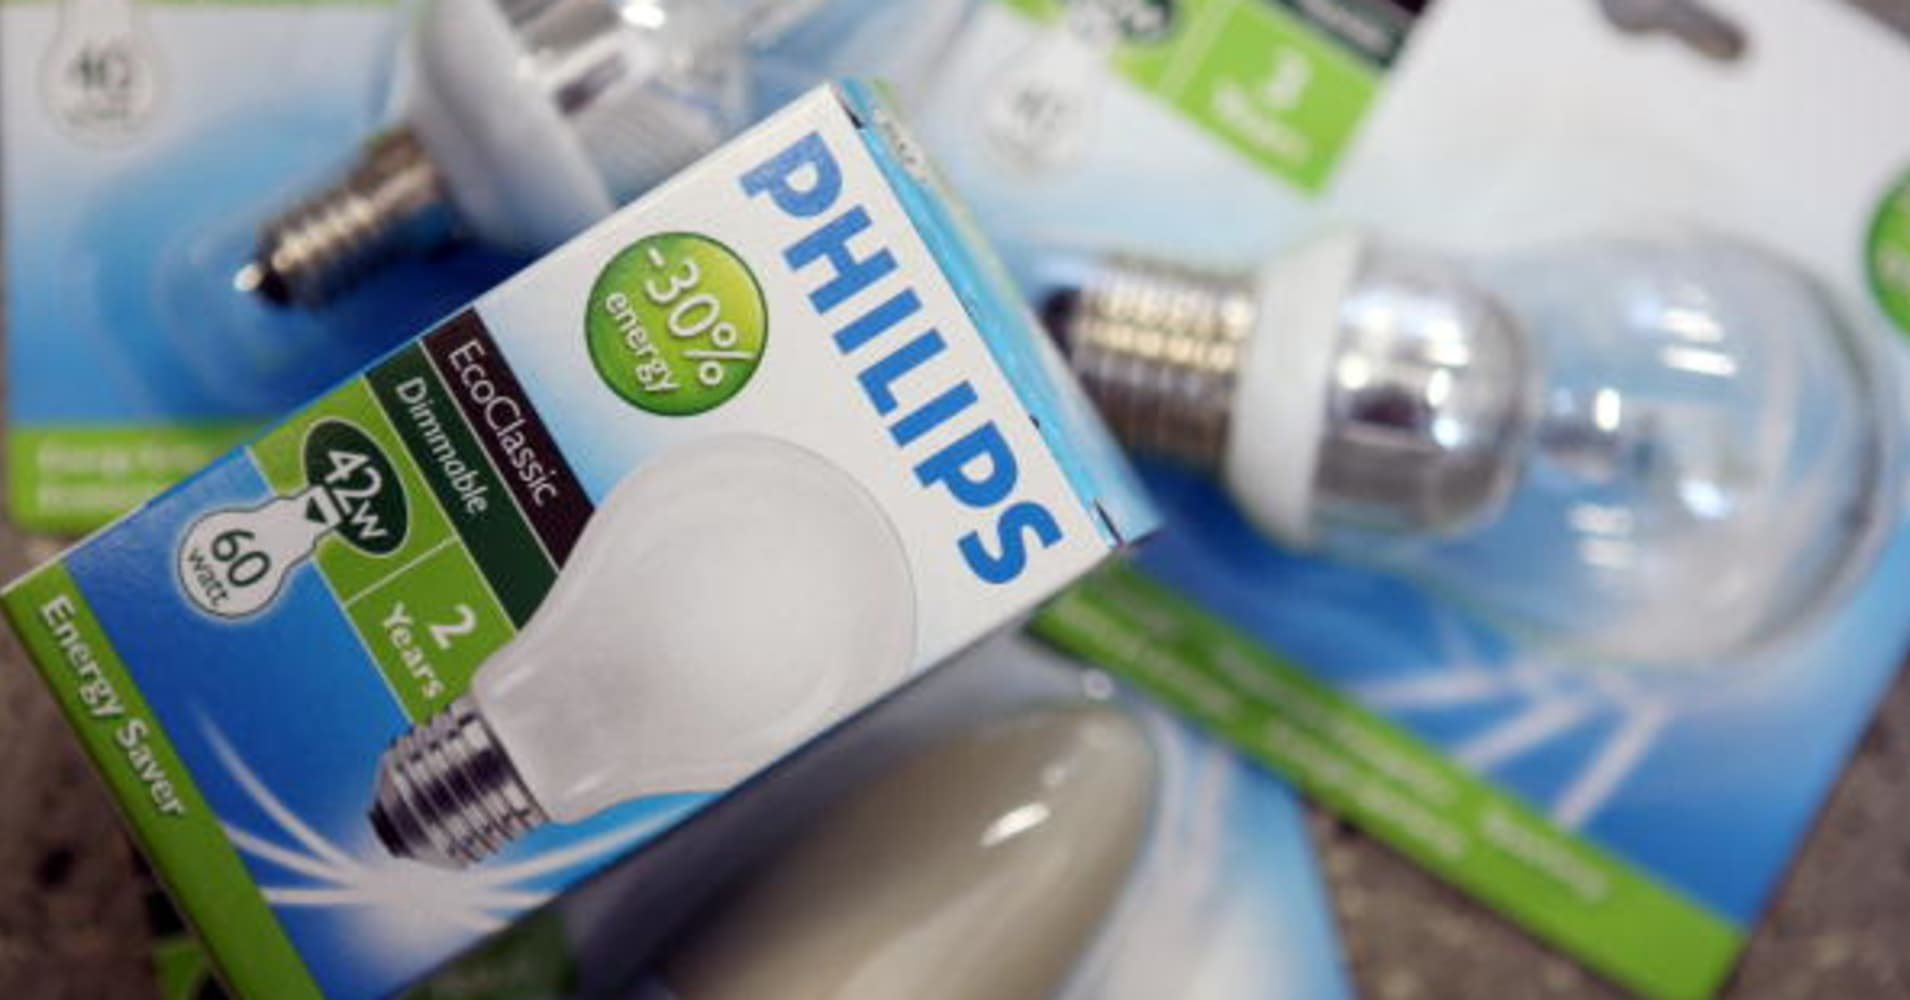 Philips lighting earnings ahead on better led home lighting margins buycottarizona